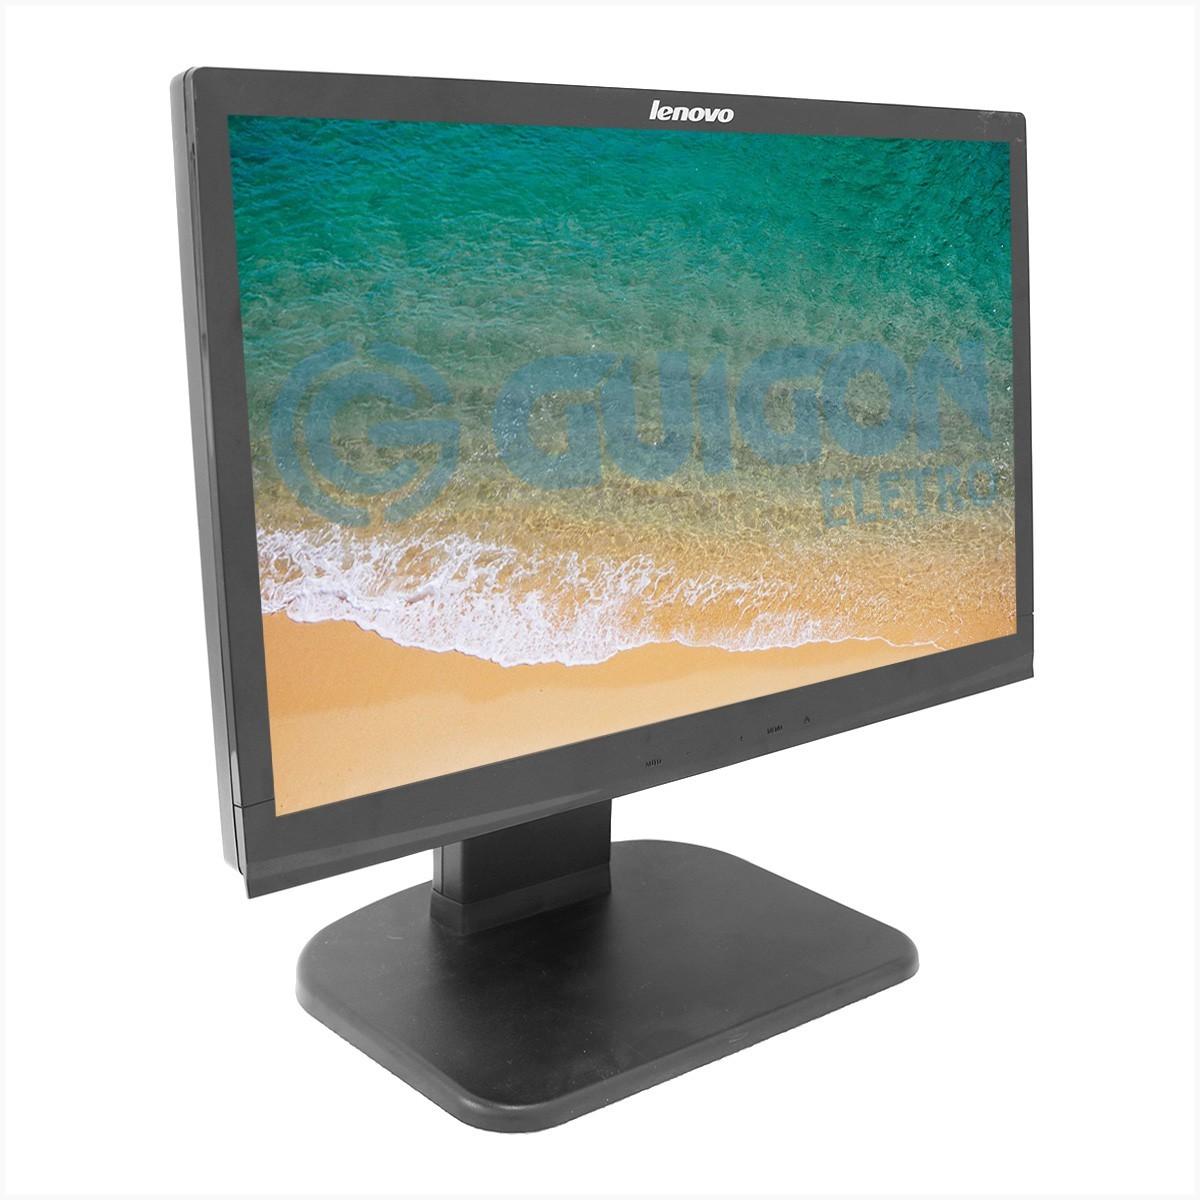 "Monitor lenovo ls1921wa 19"" - usado"